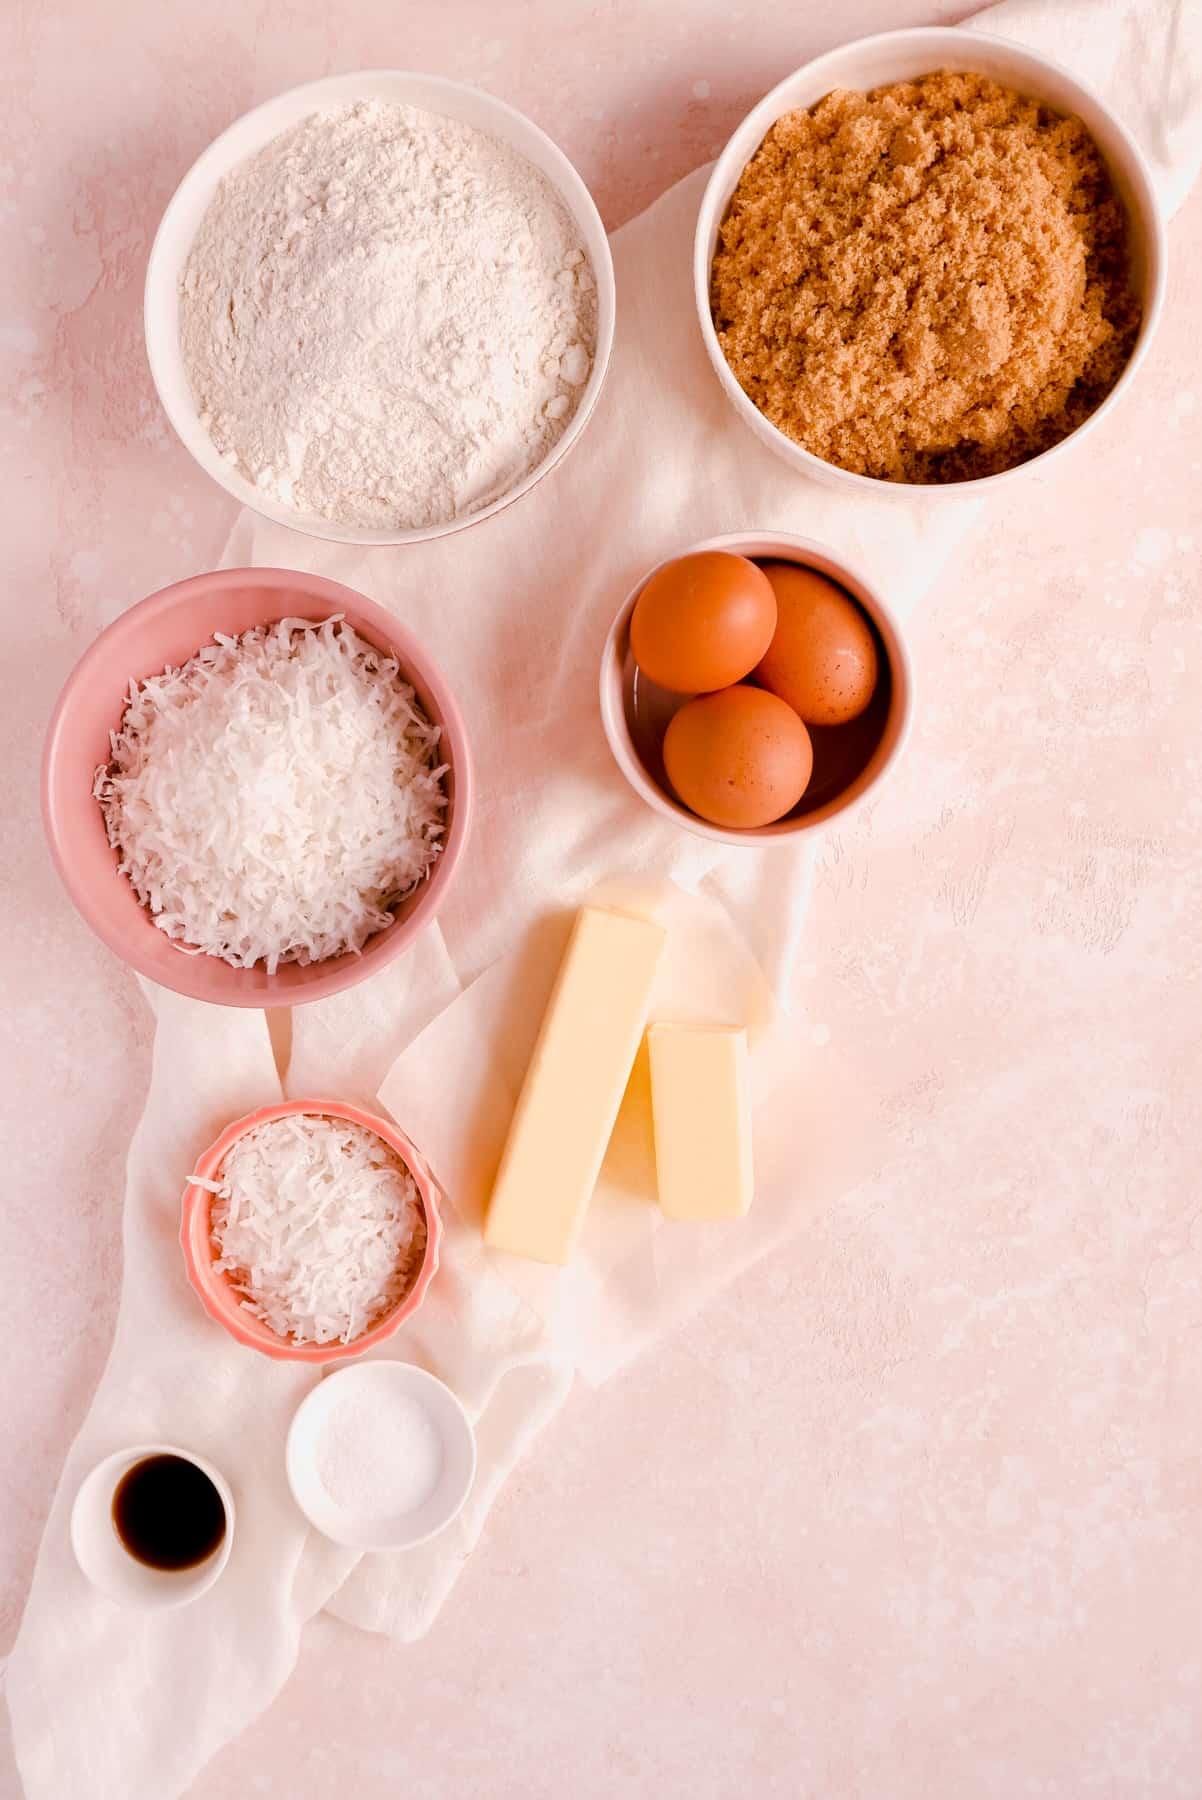 butterscotch bar ingredients in bowls